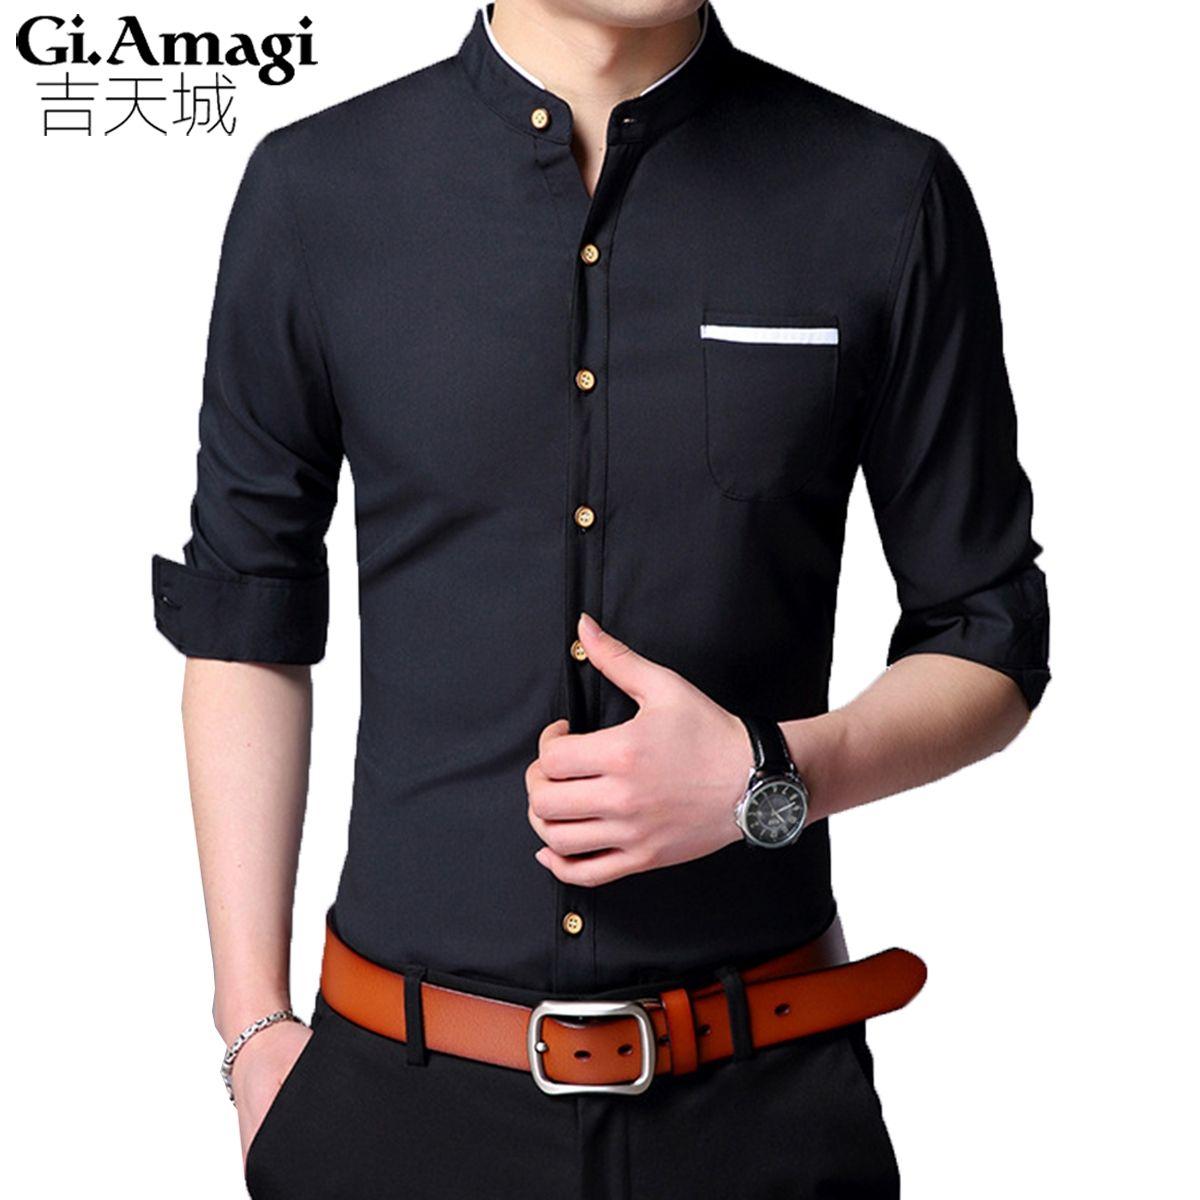 Cheap Collar Shirts Wholesale